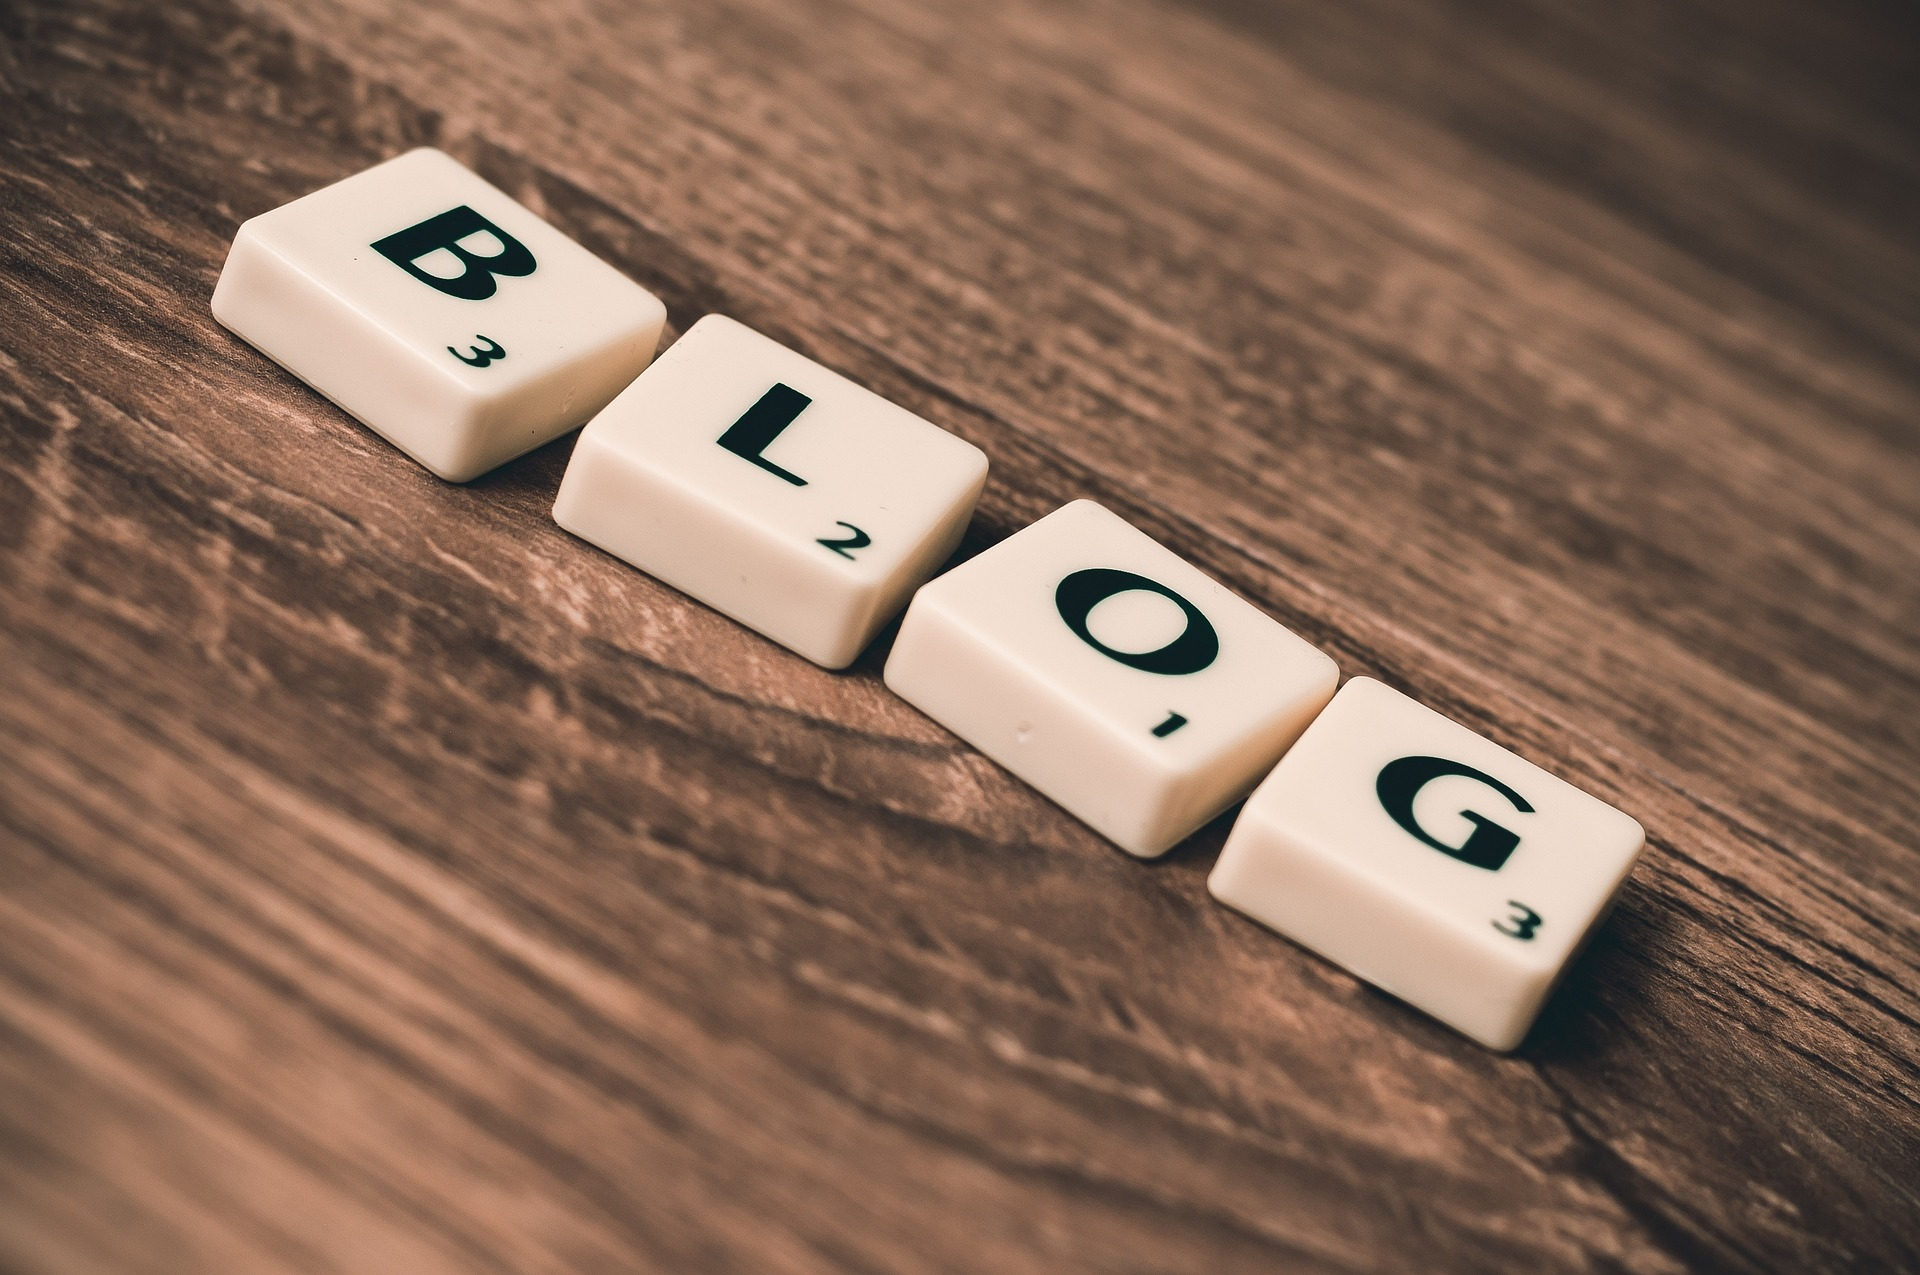 7_consejos_para_aumentar_trafico_a_tu_sitio_web_-_blog.jpg